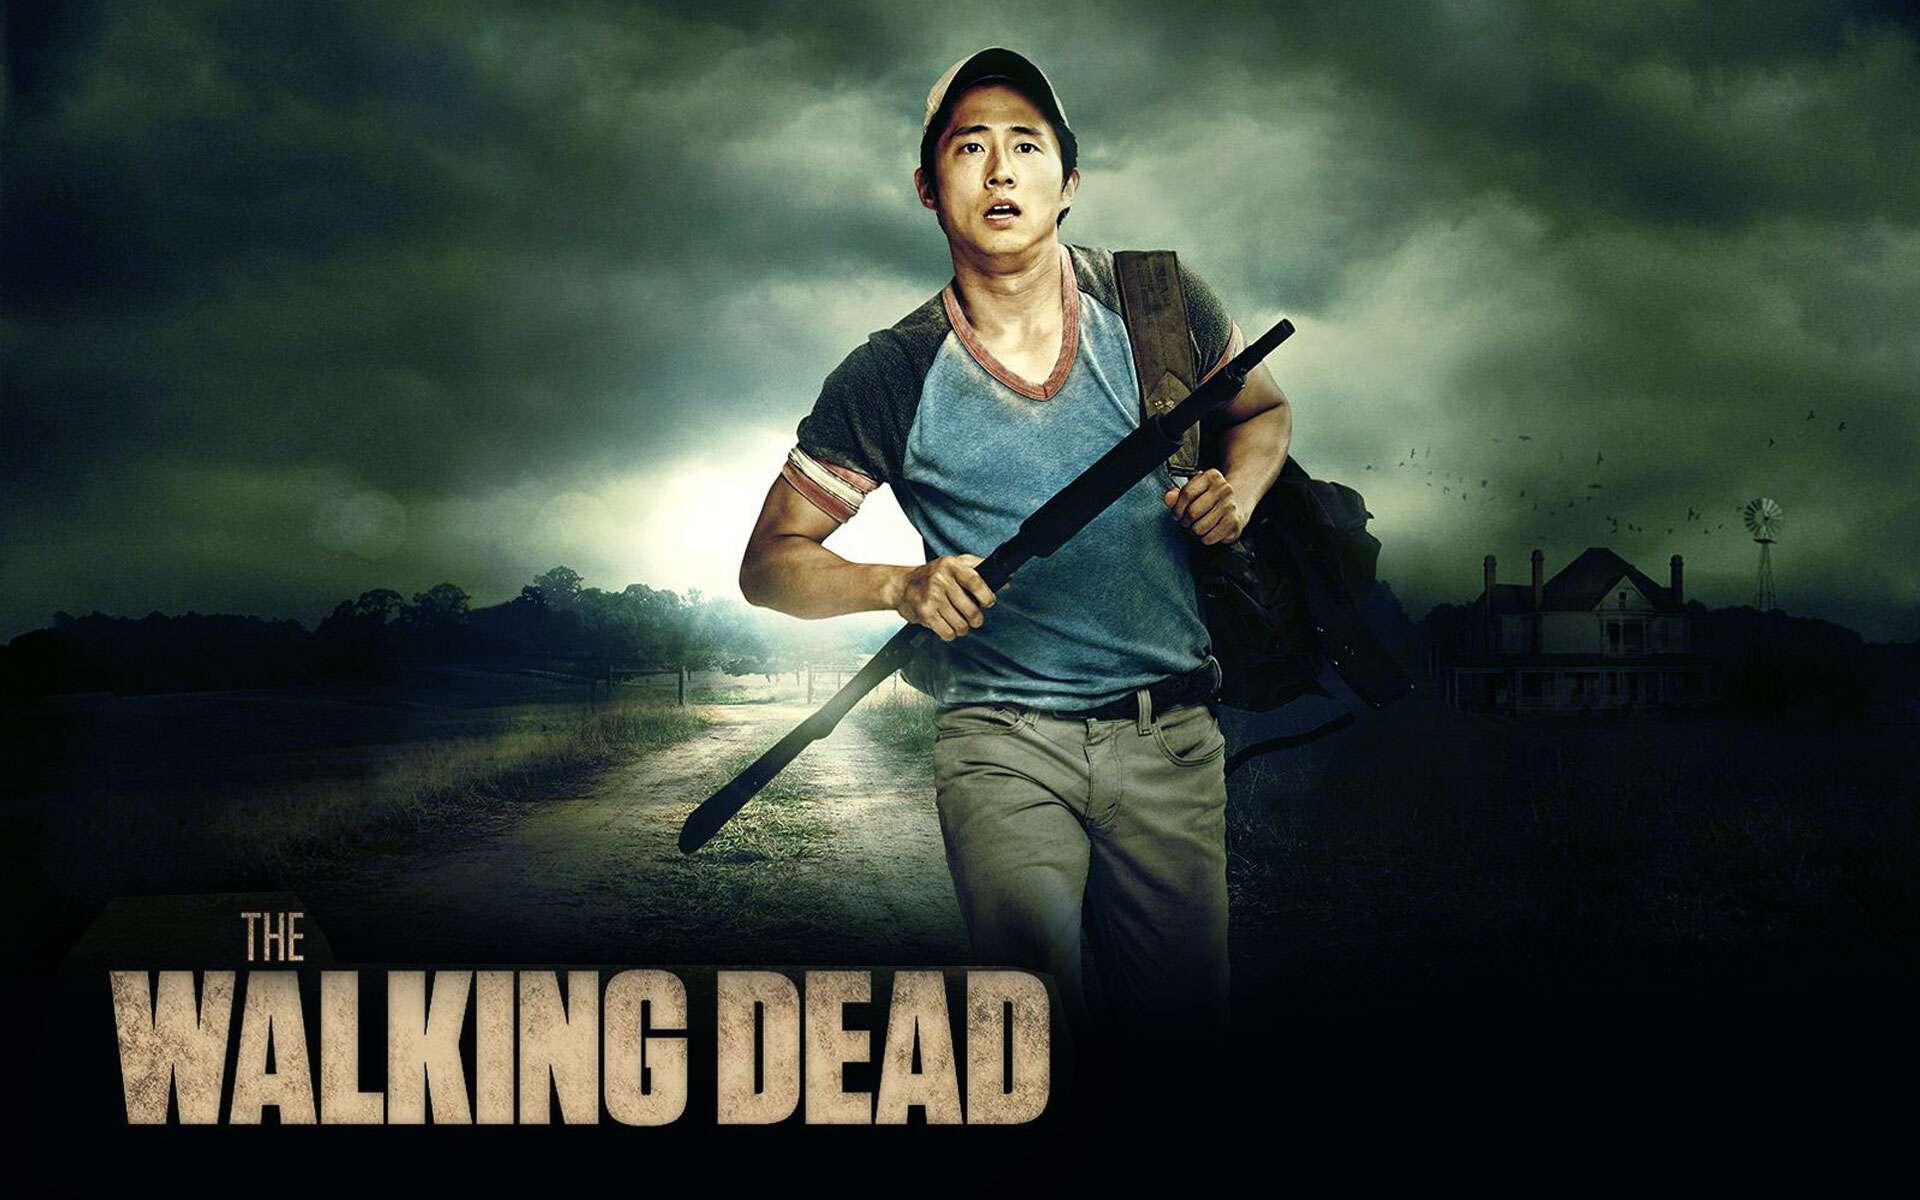 The Walking Dead wallpapers HD   Taringa 1920x1200